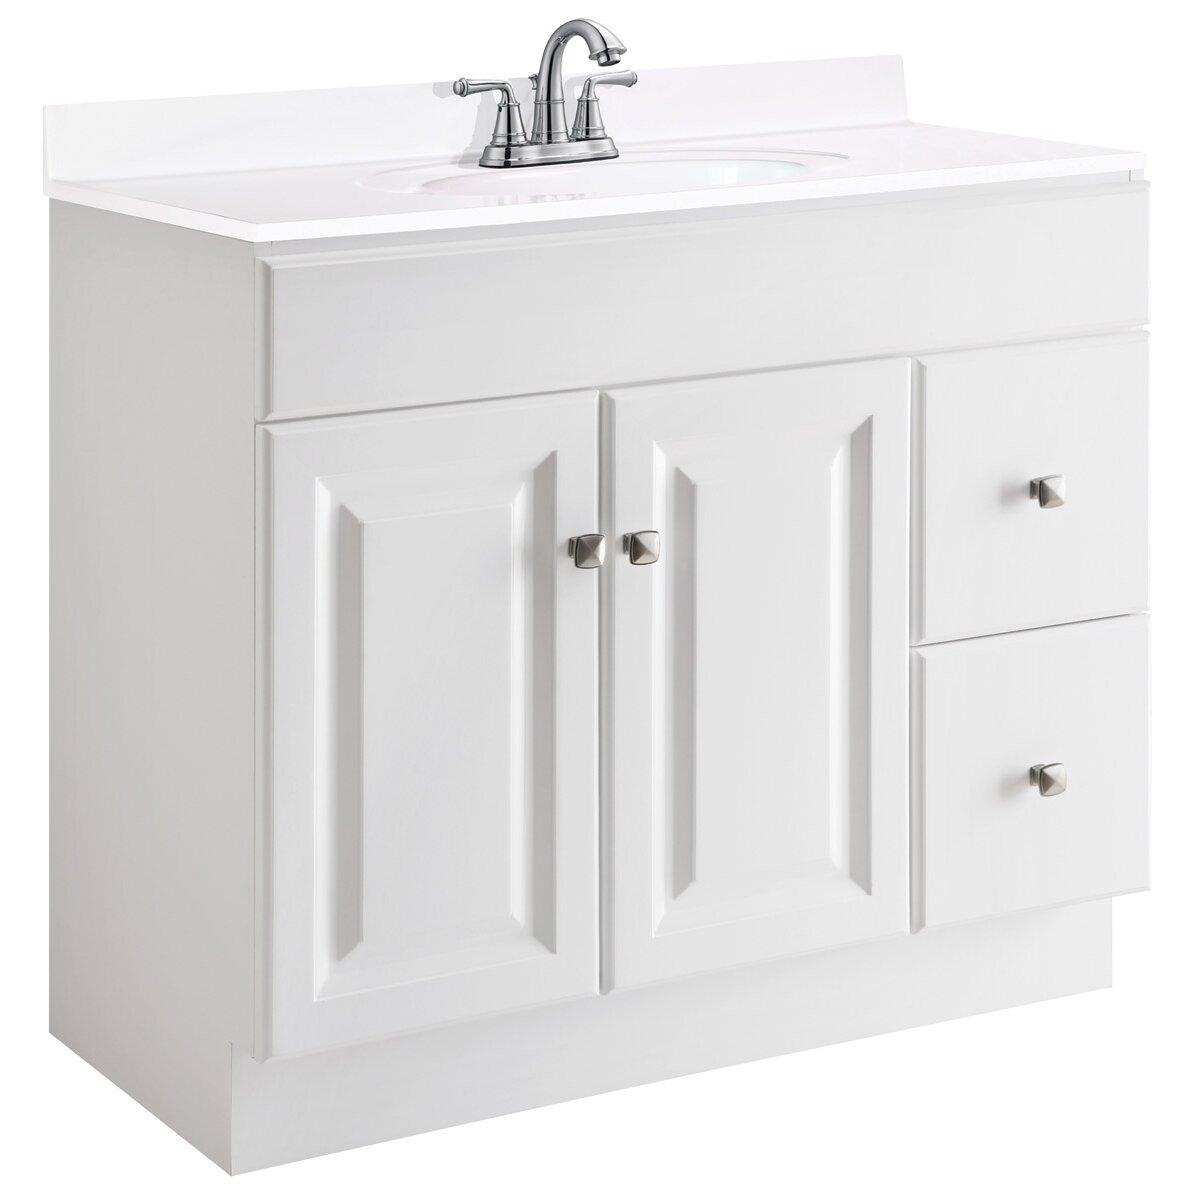 "Home Design Bathroom Vanity: Design House Wyndham 36"" Single Bathroom Vanity Base"